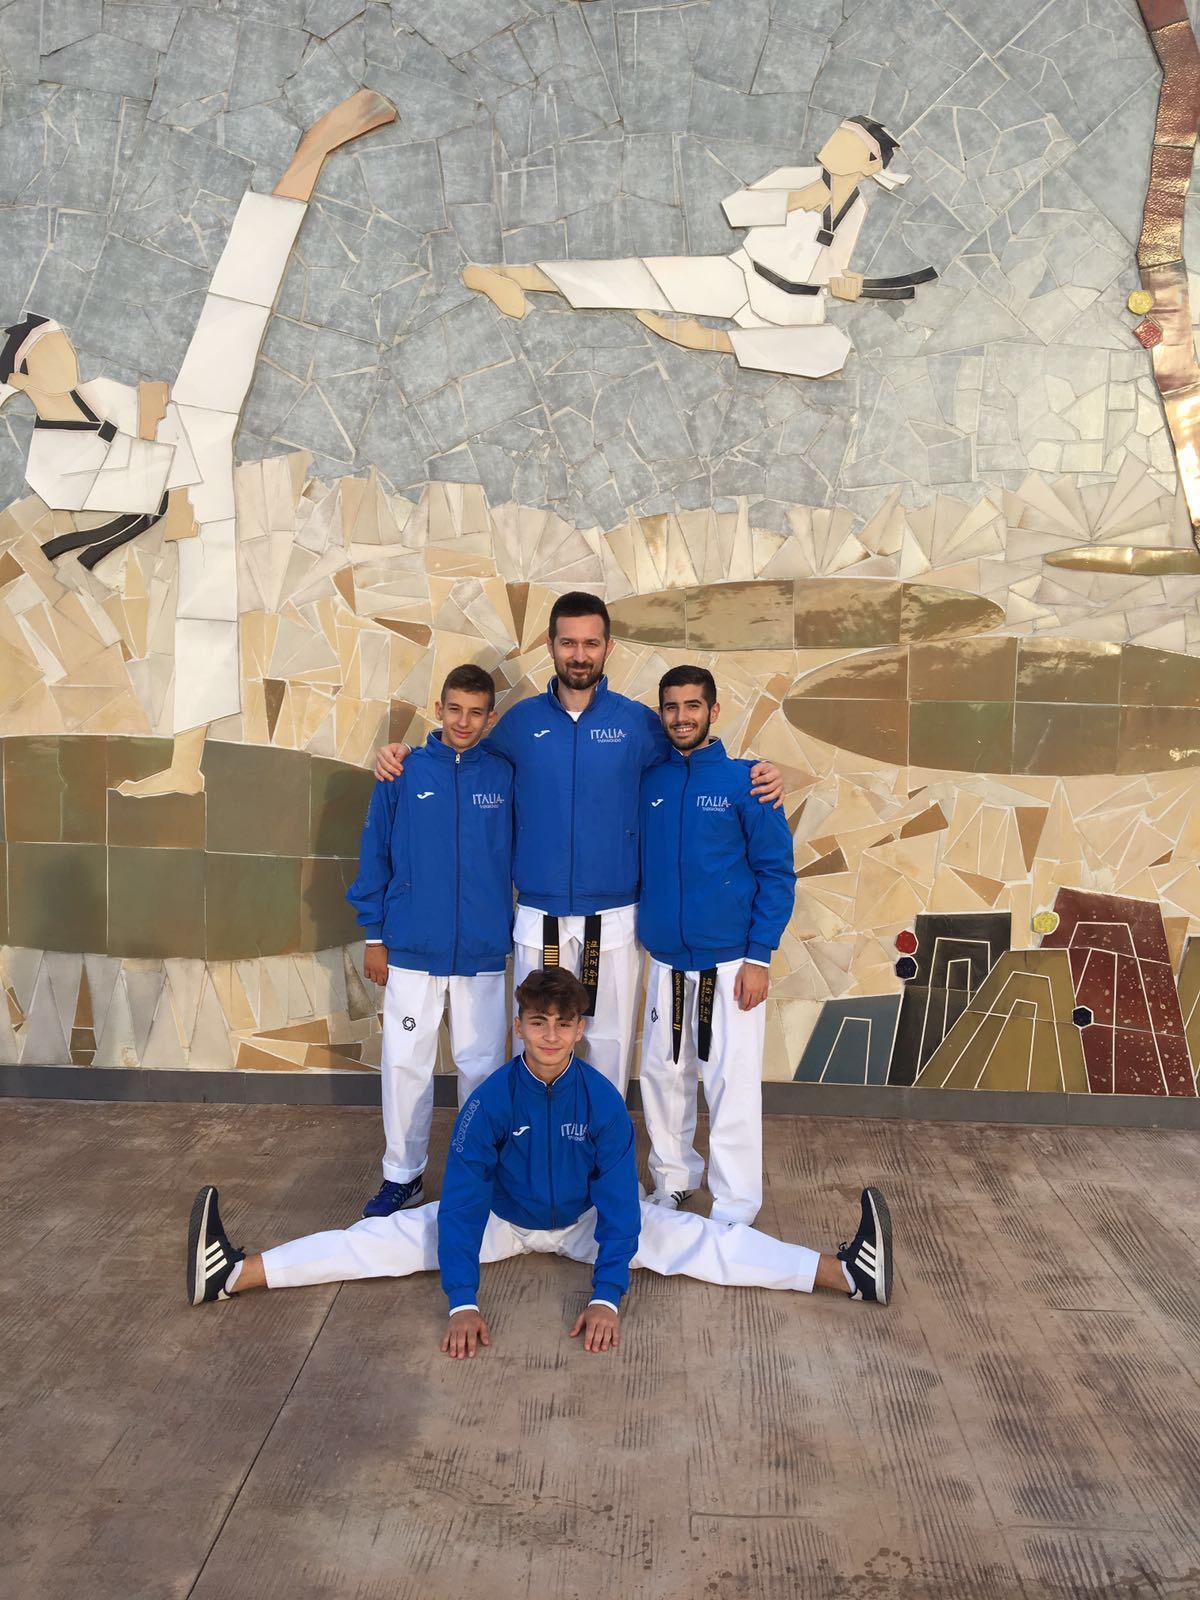 I 4 di taekwondo Mansé martina franca a Muju sull'osservatorio di Taekwondowon la città del Taekwondo mondiale!